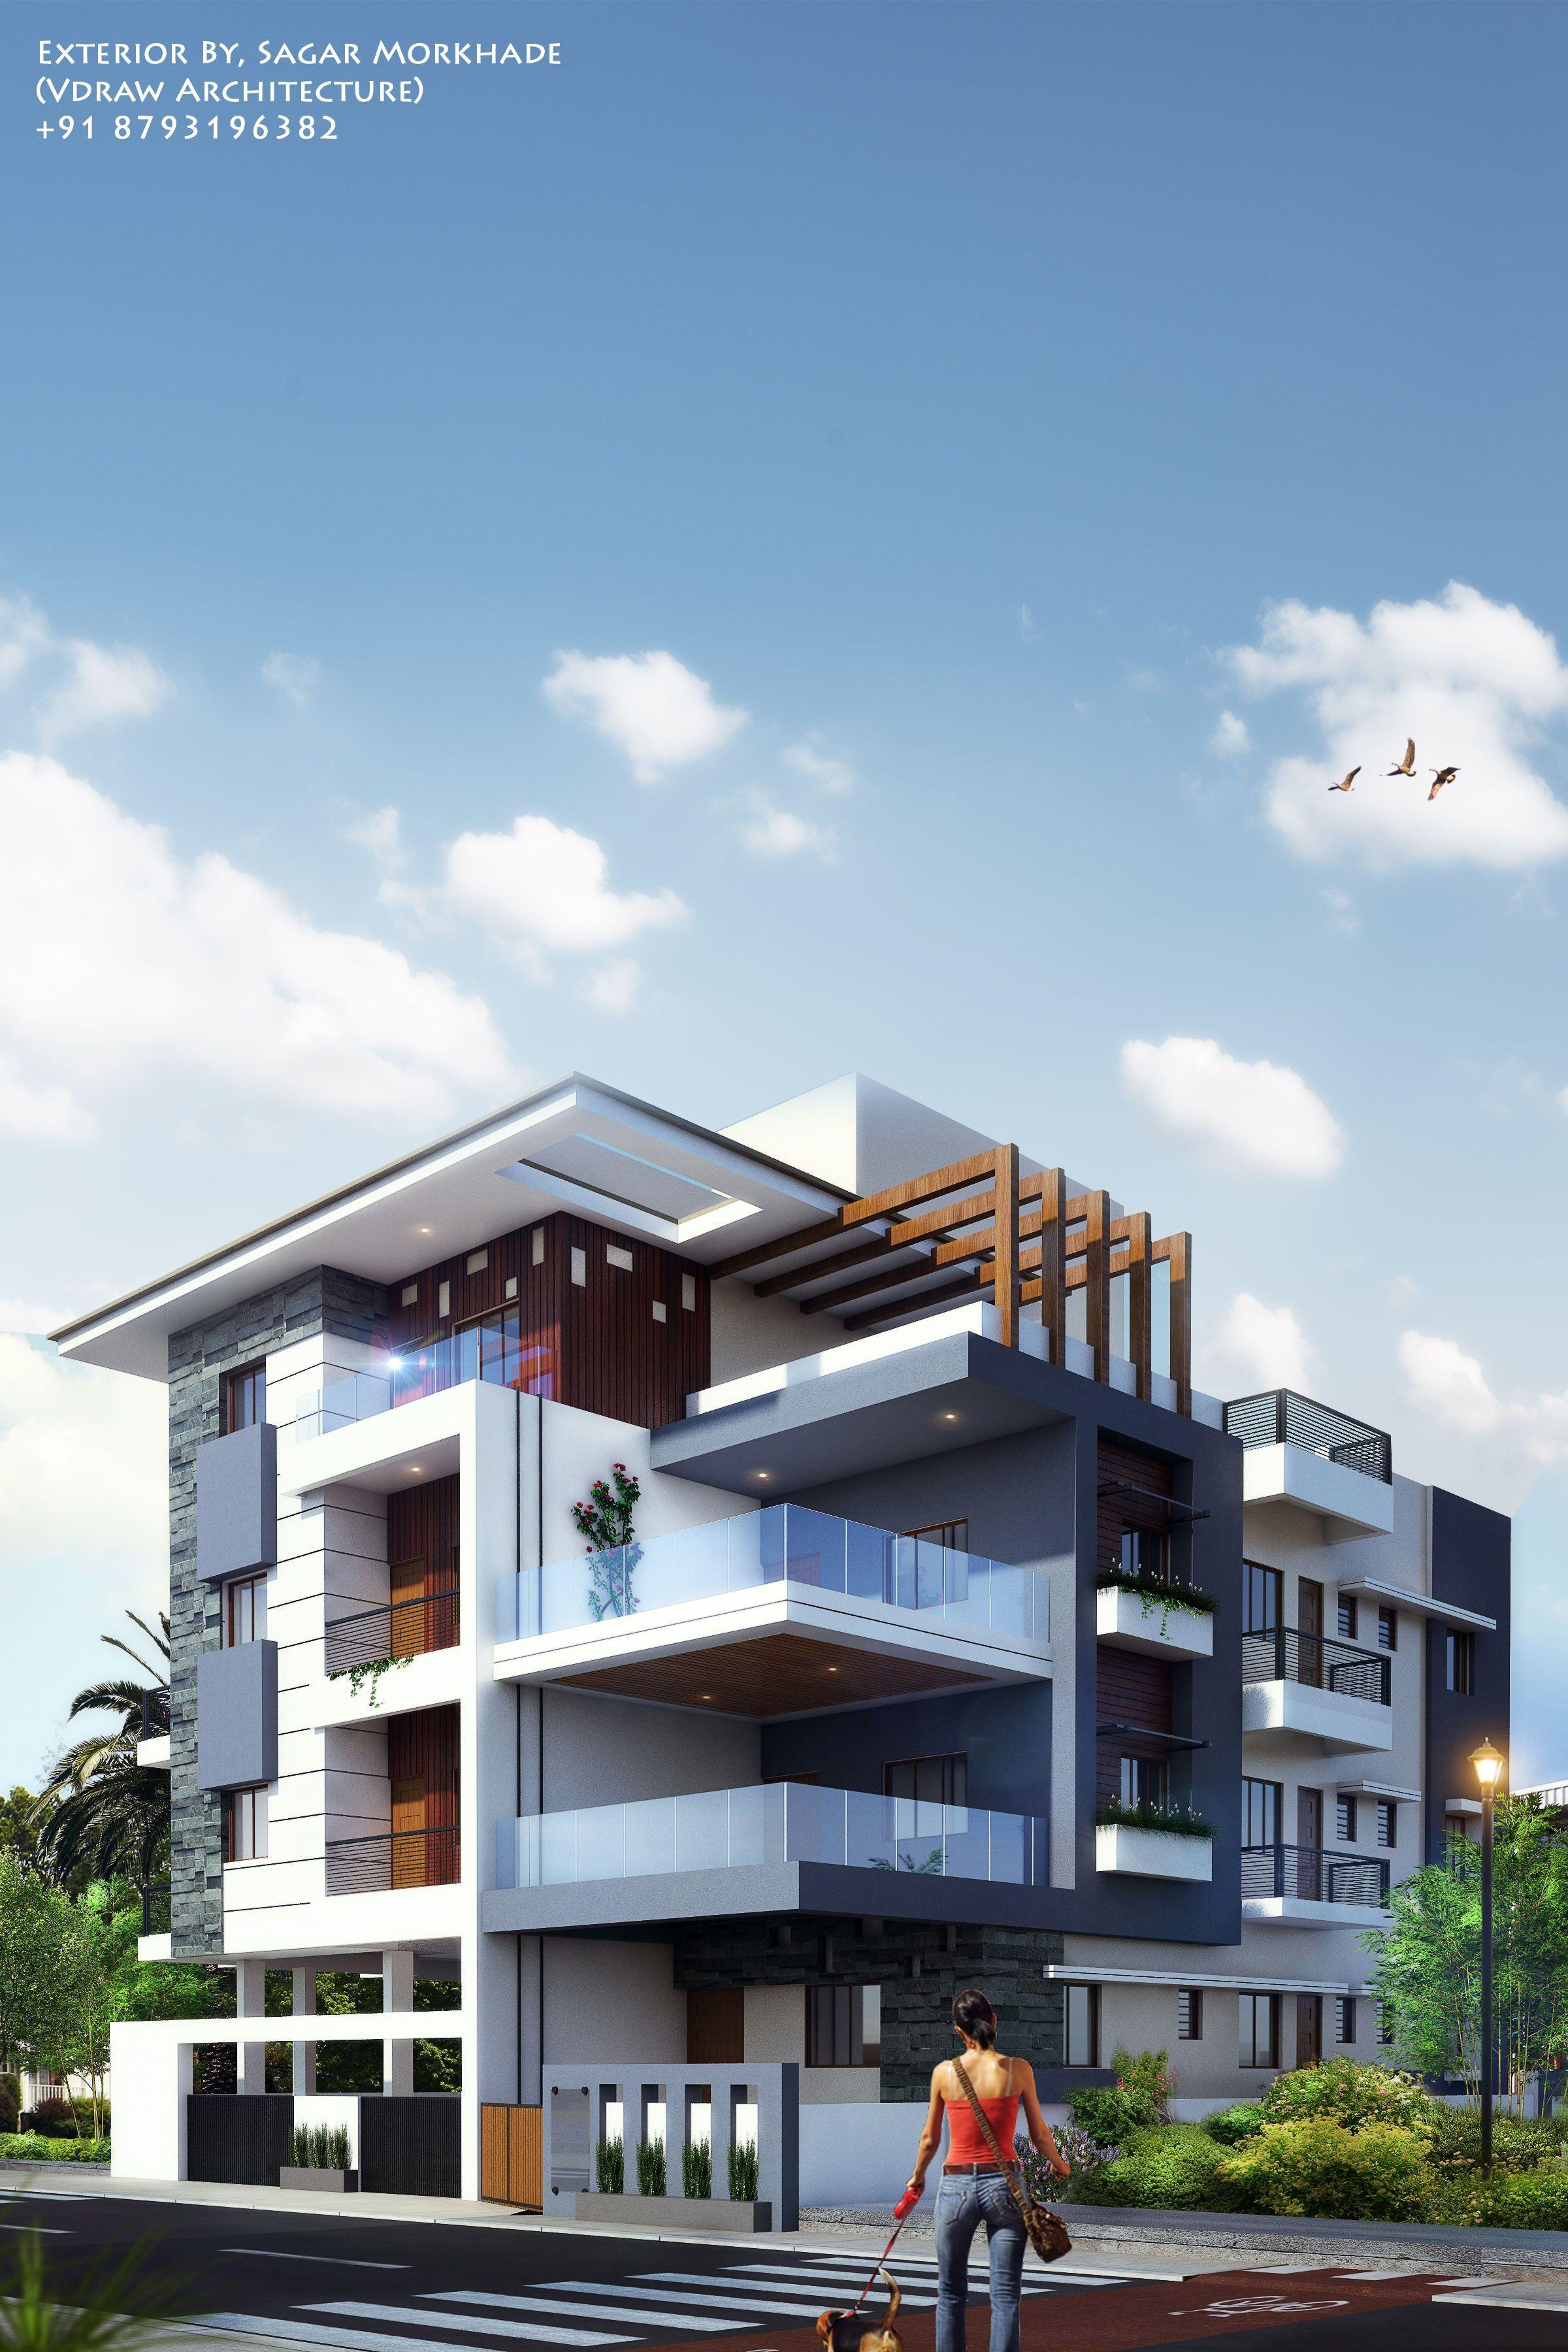 Modern House Bungalow Exterior By Ar Sagar Morkhade Vdraw Architecture 91 8793196382: Exterior By, Sagar Morkhade (Vdraw Architecture) +91 8793196382 (With Images)